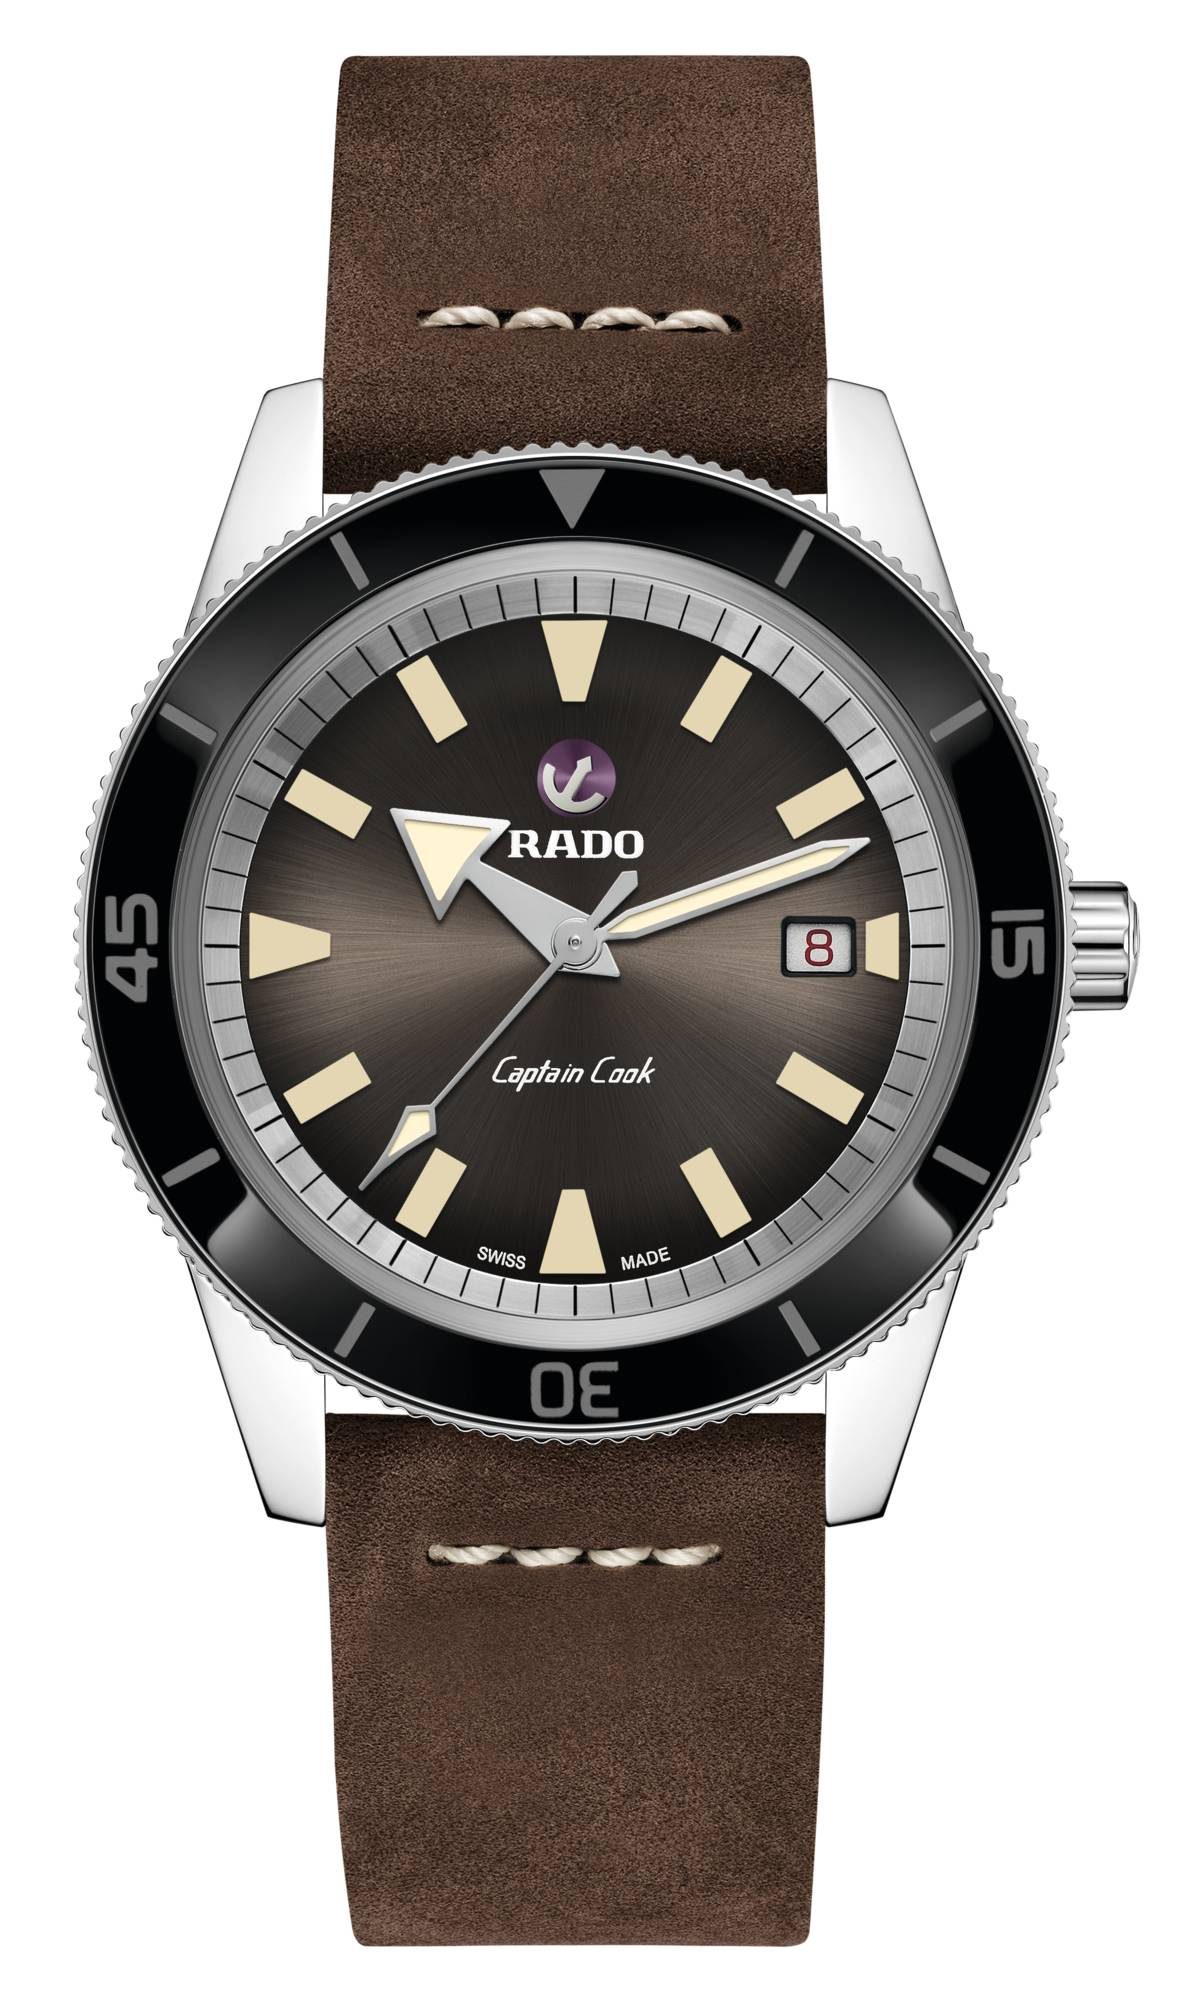 Captain Cook Automatic horloge Bruin | Rado